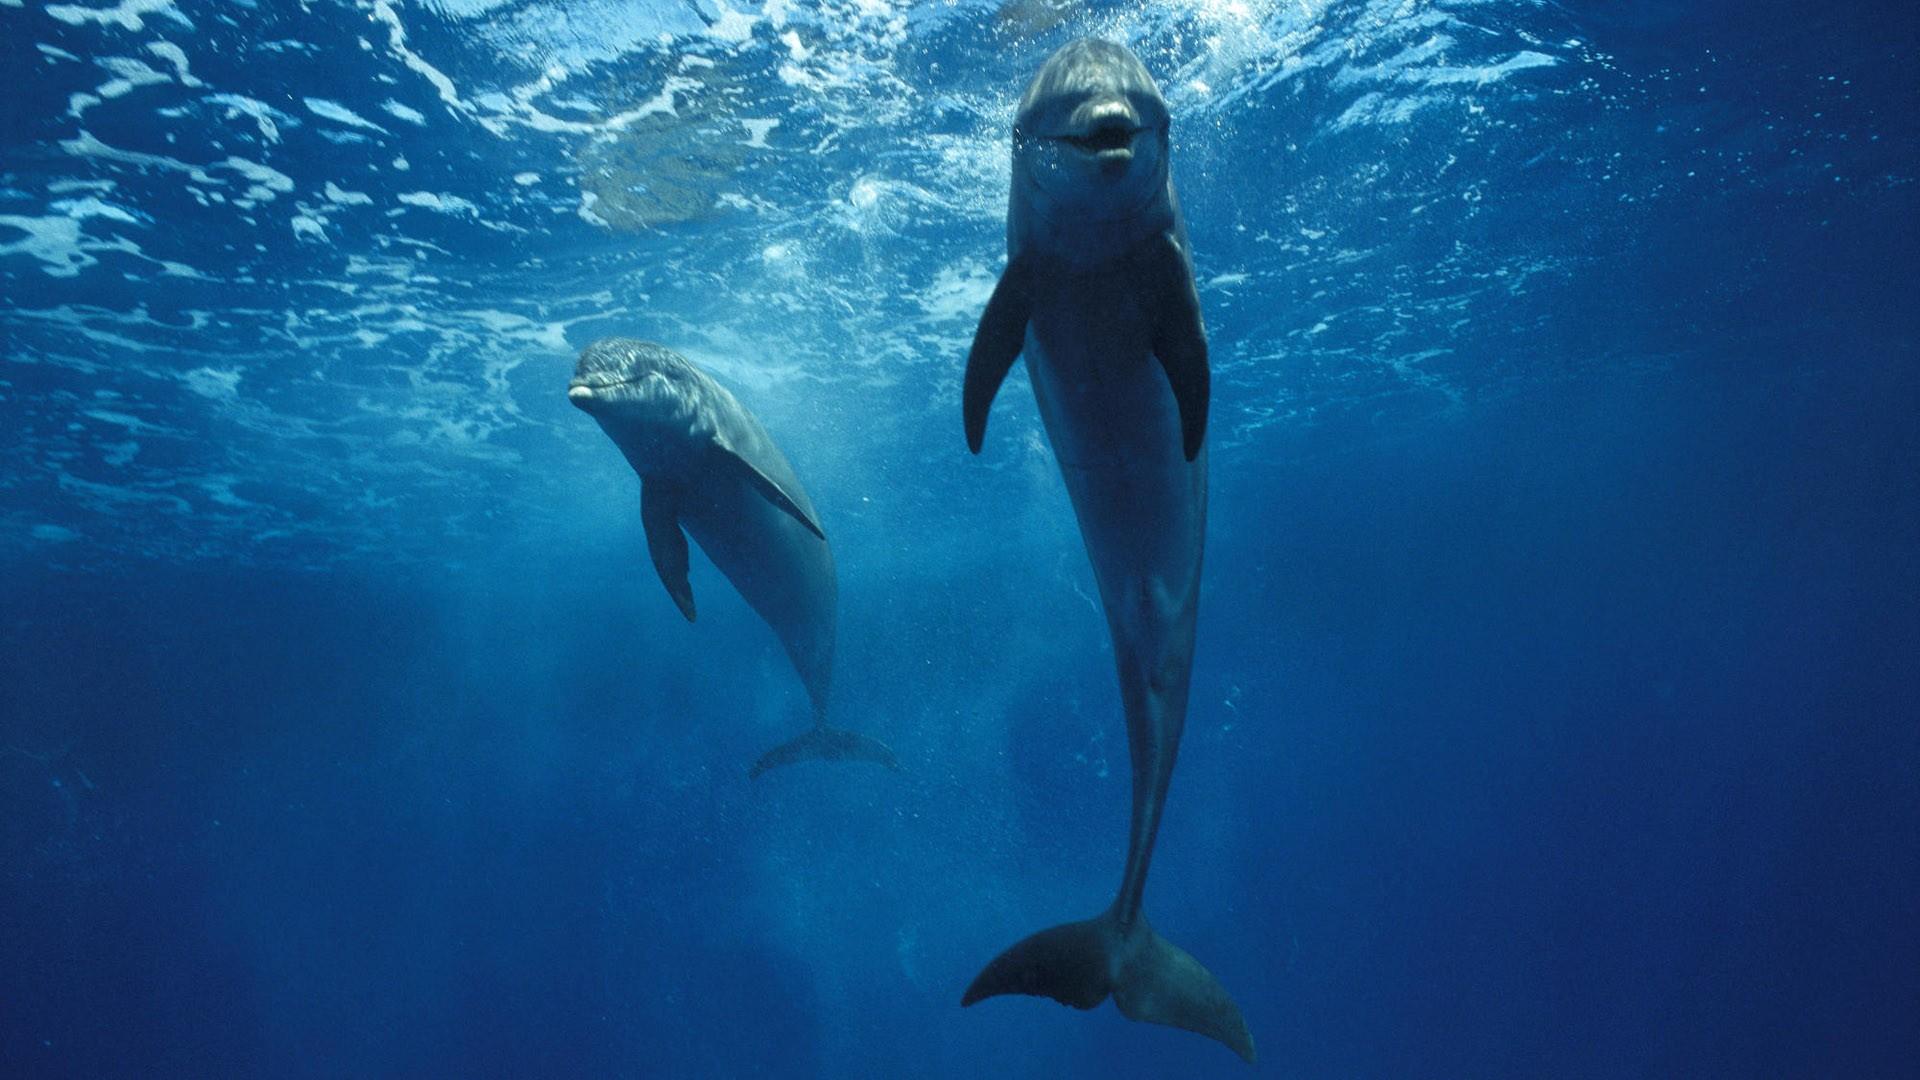 Dolphins 1920x1080 HD Image Animals Marine 1920x1080